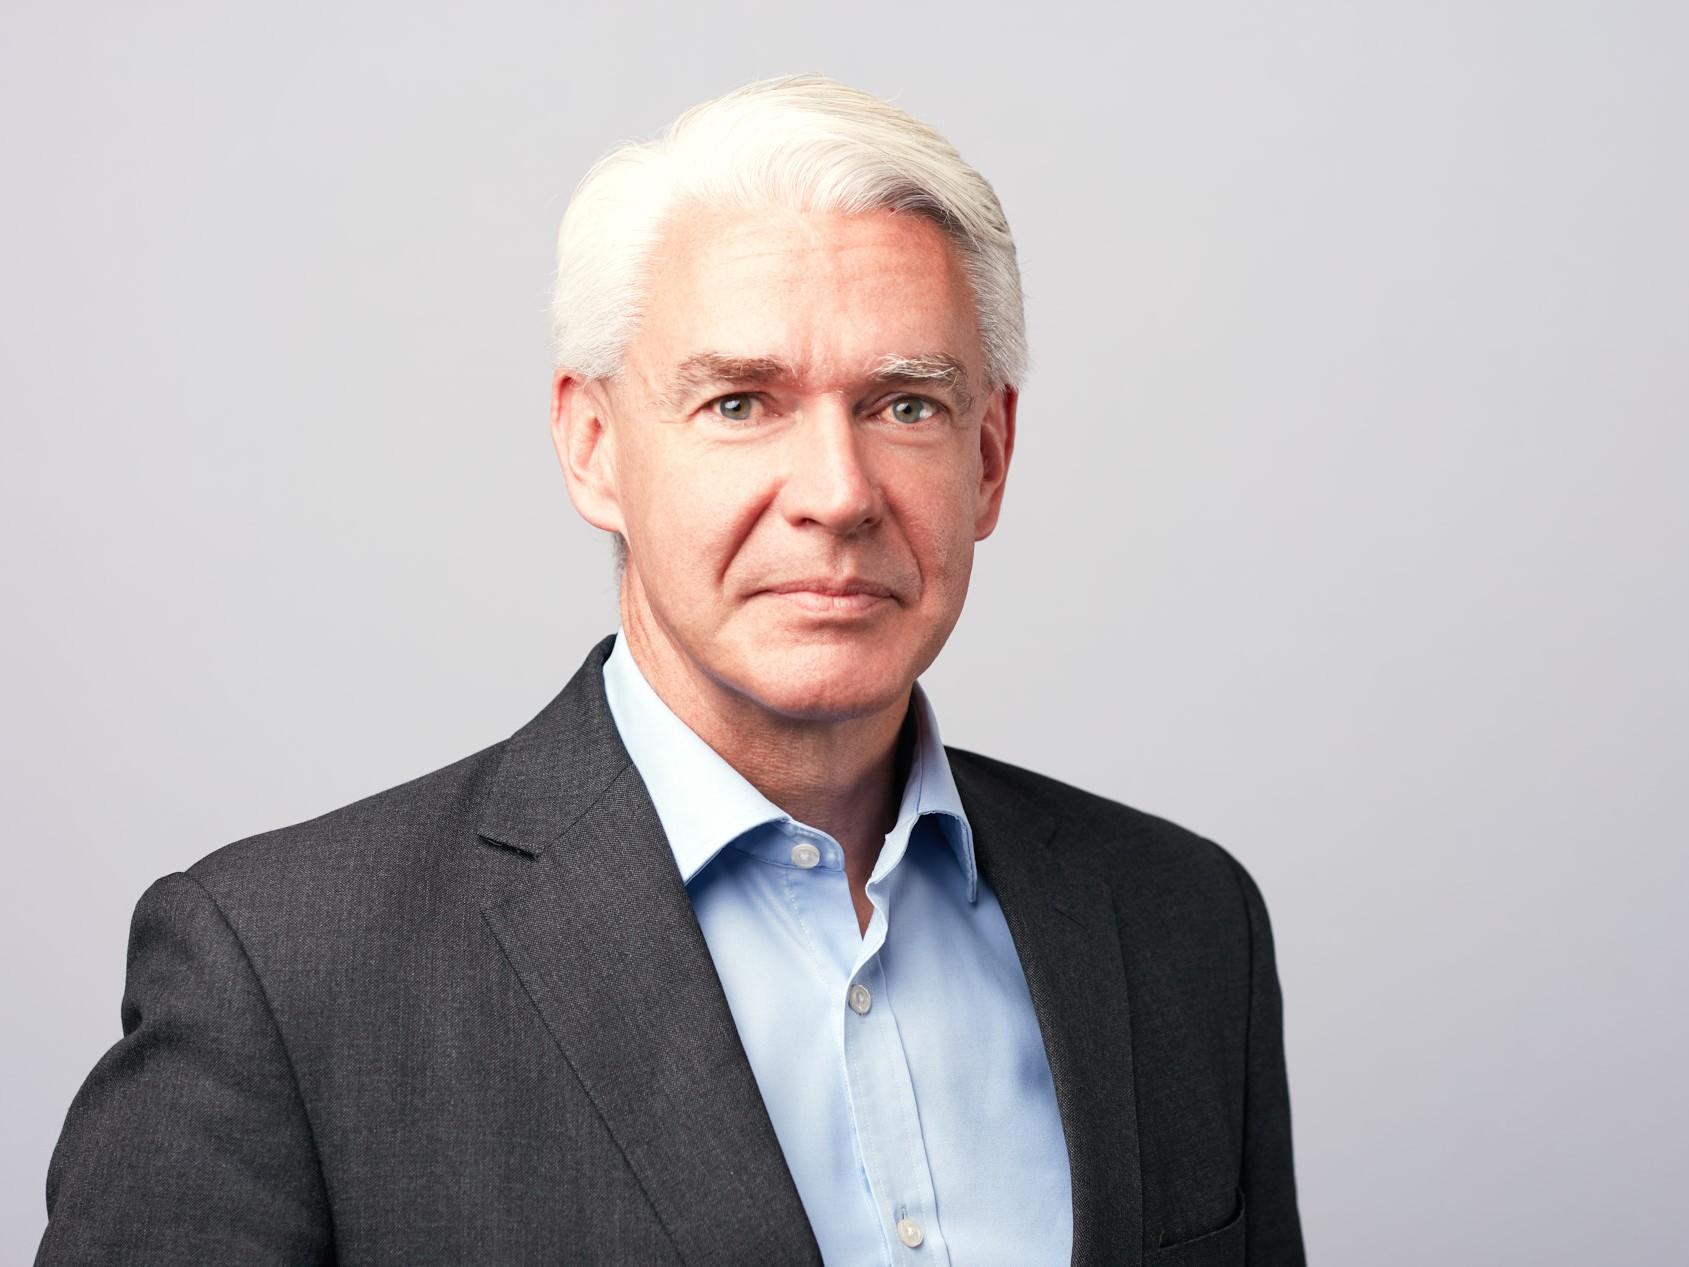 Modern Executive Headshots of White-Haired Businessman   Dallas Headshot Photographer